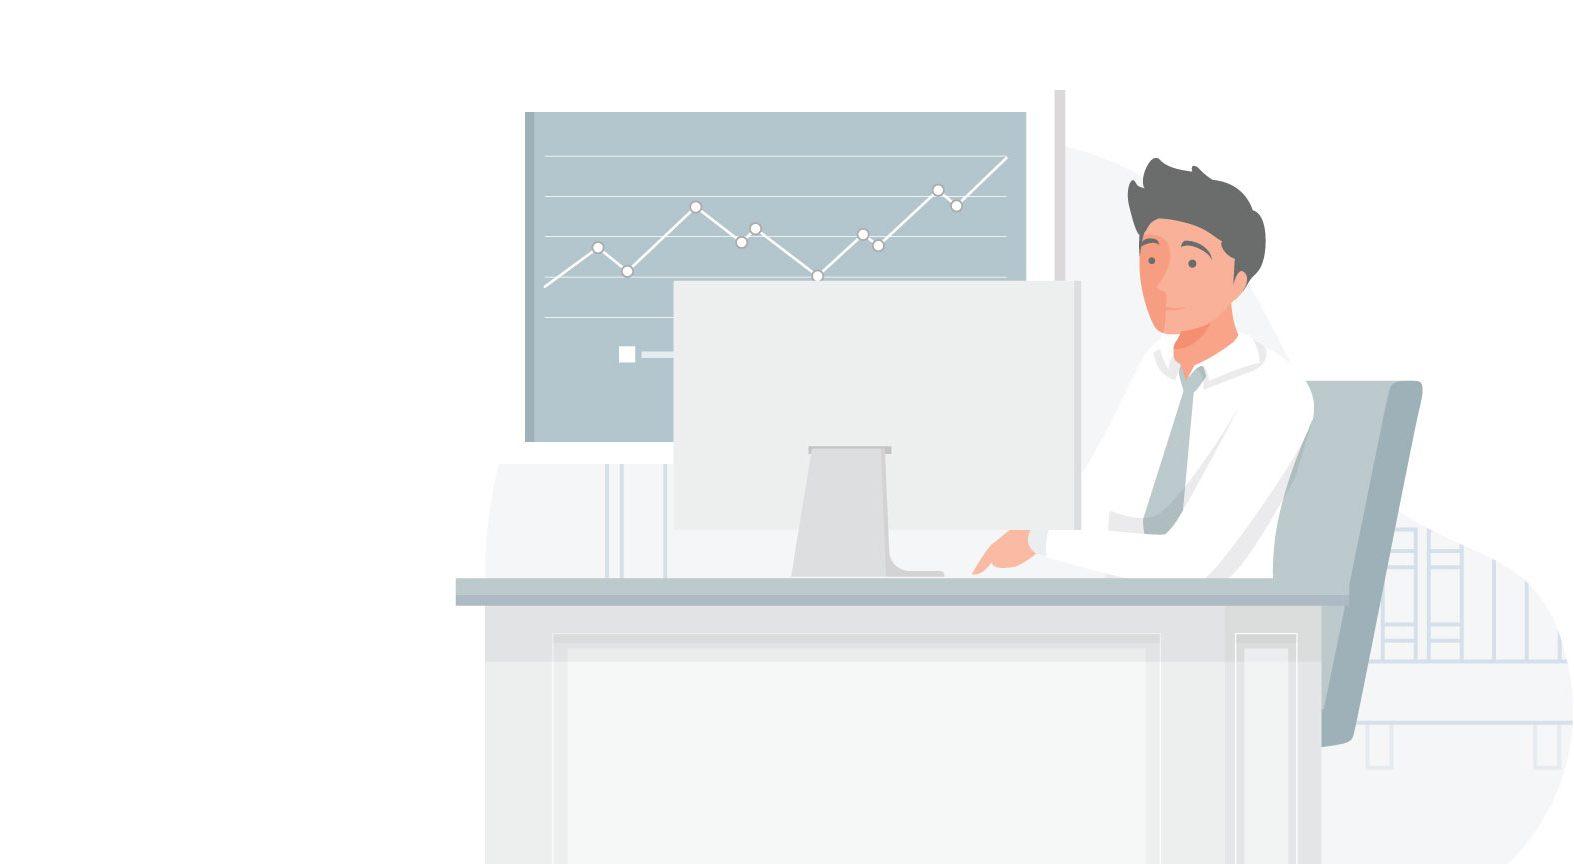 Analiza kredytowa